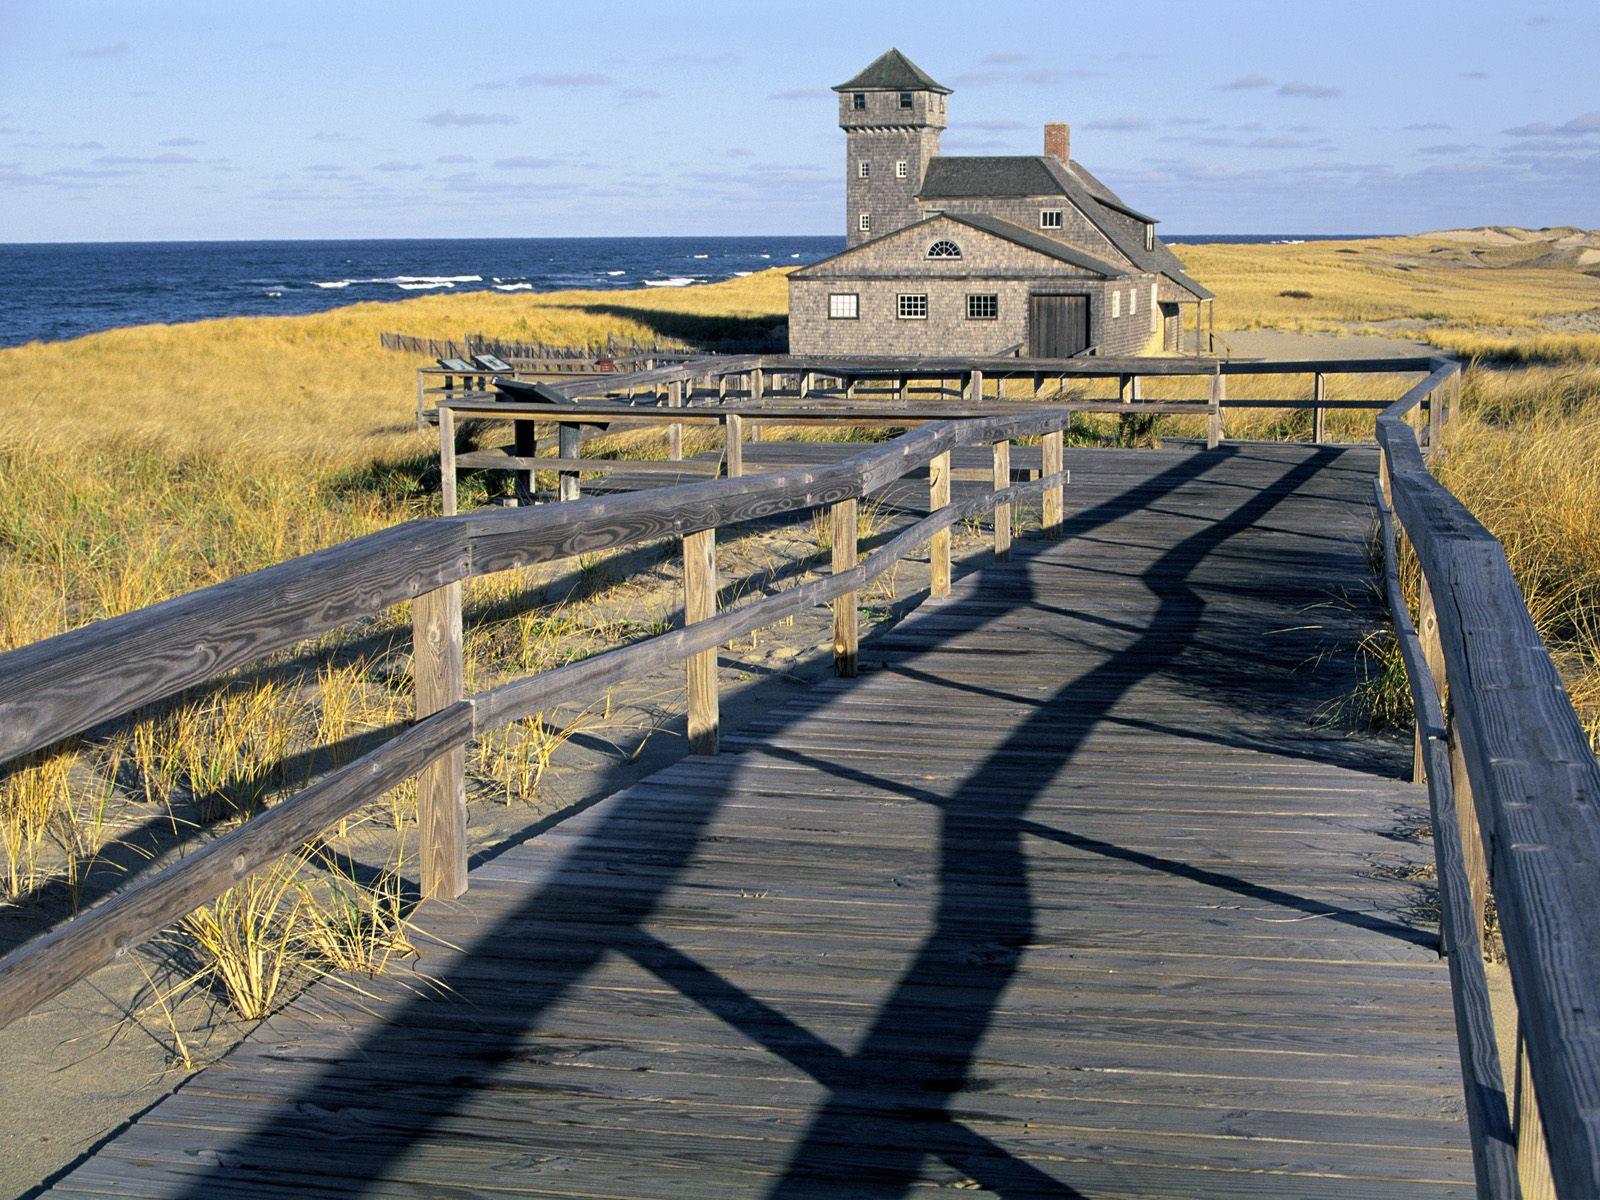 Download Background   Cape Cod National Seashore Massachusetts 1600x1200